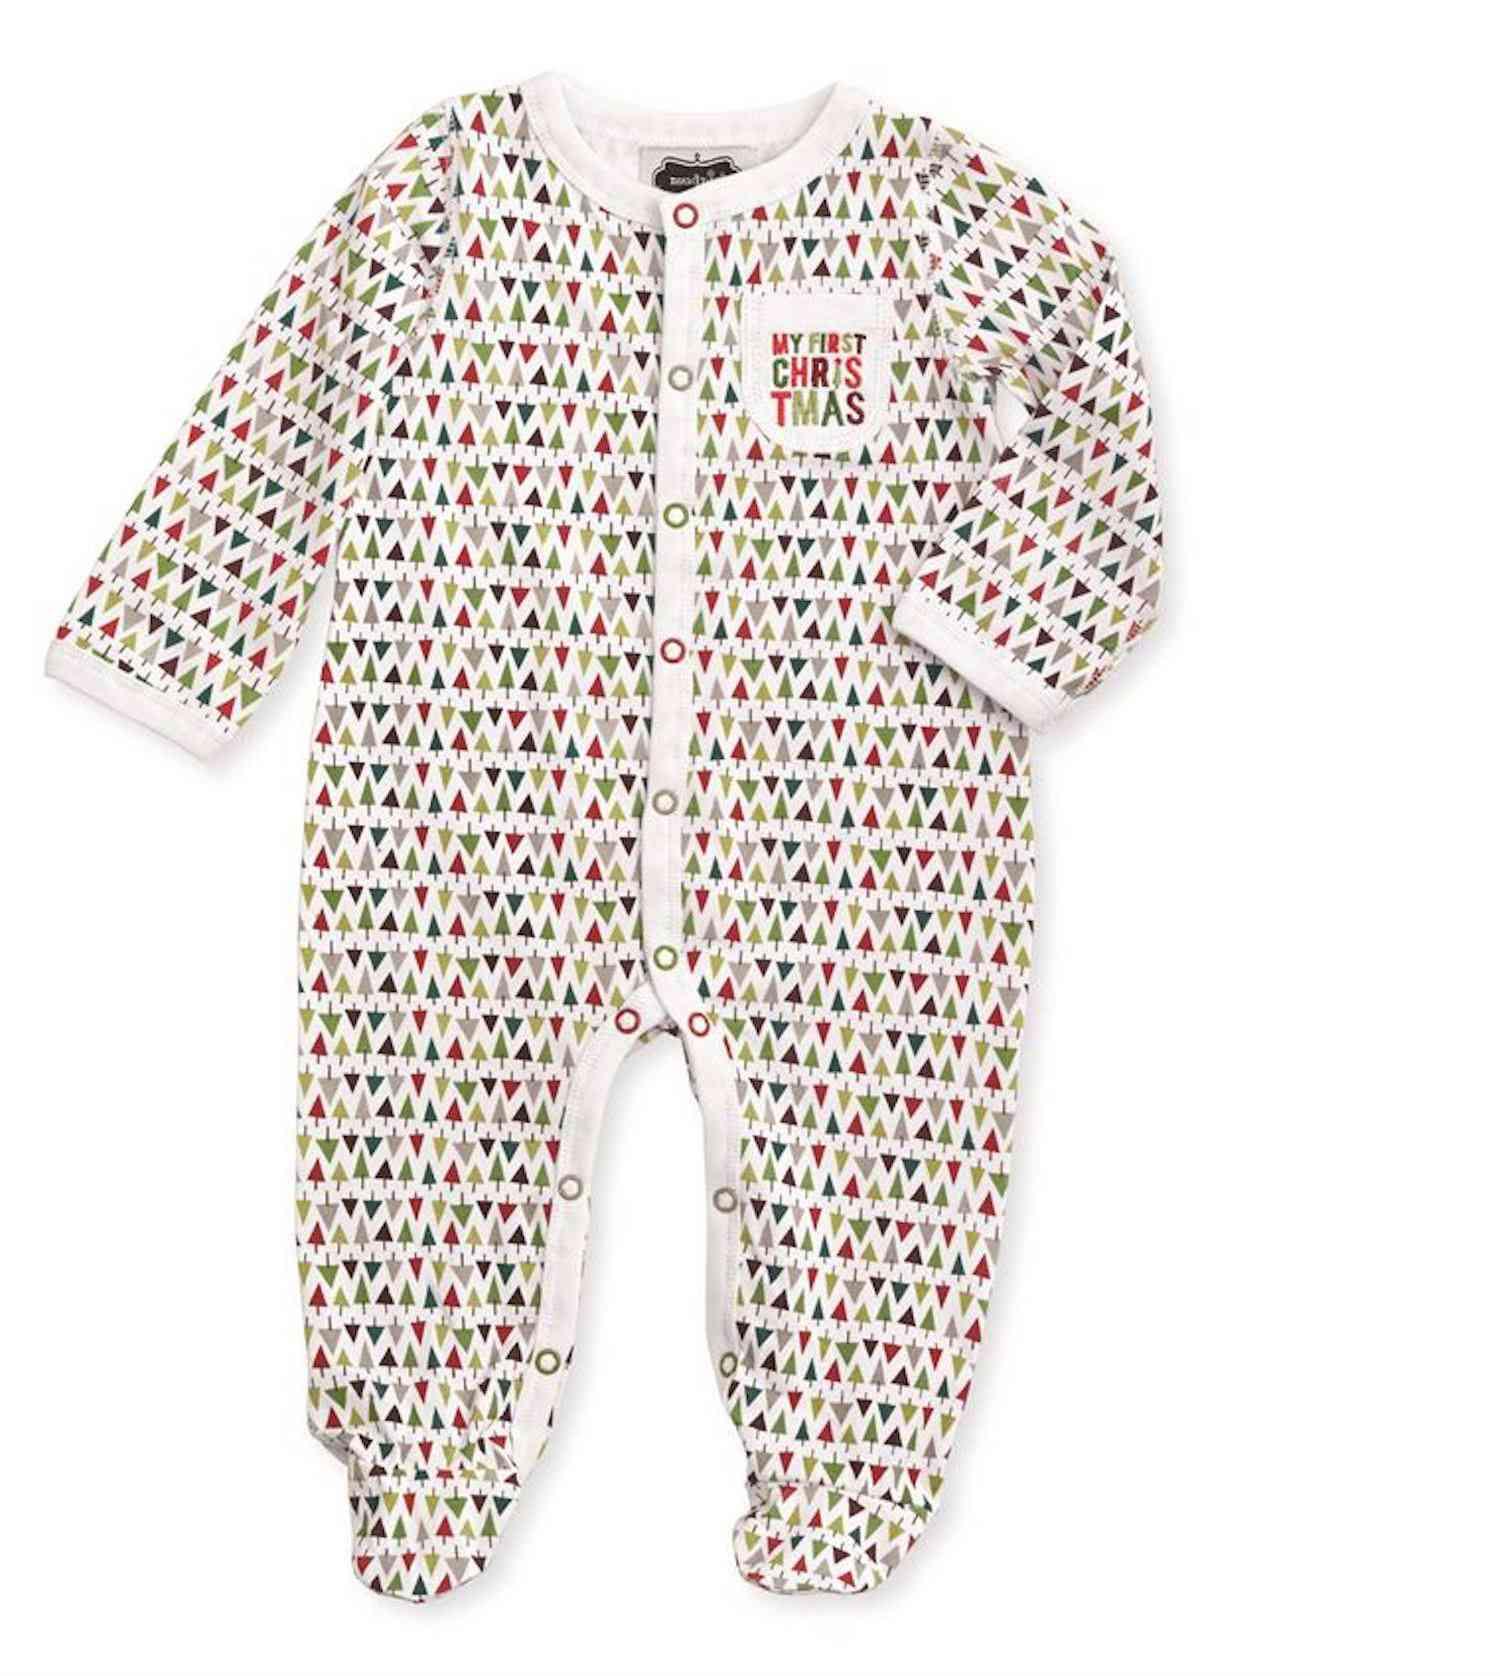 20 adorable babys first christmas outfits - Mud Pie Christmas Pajamas